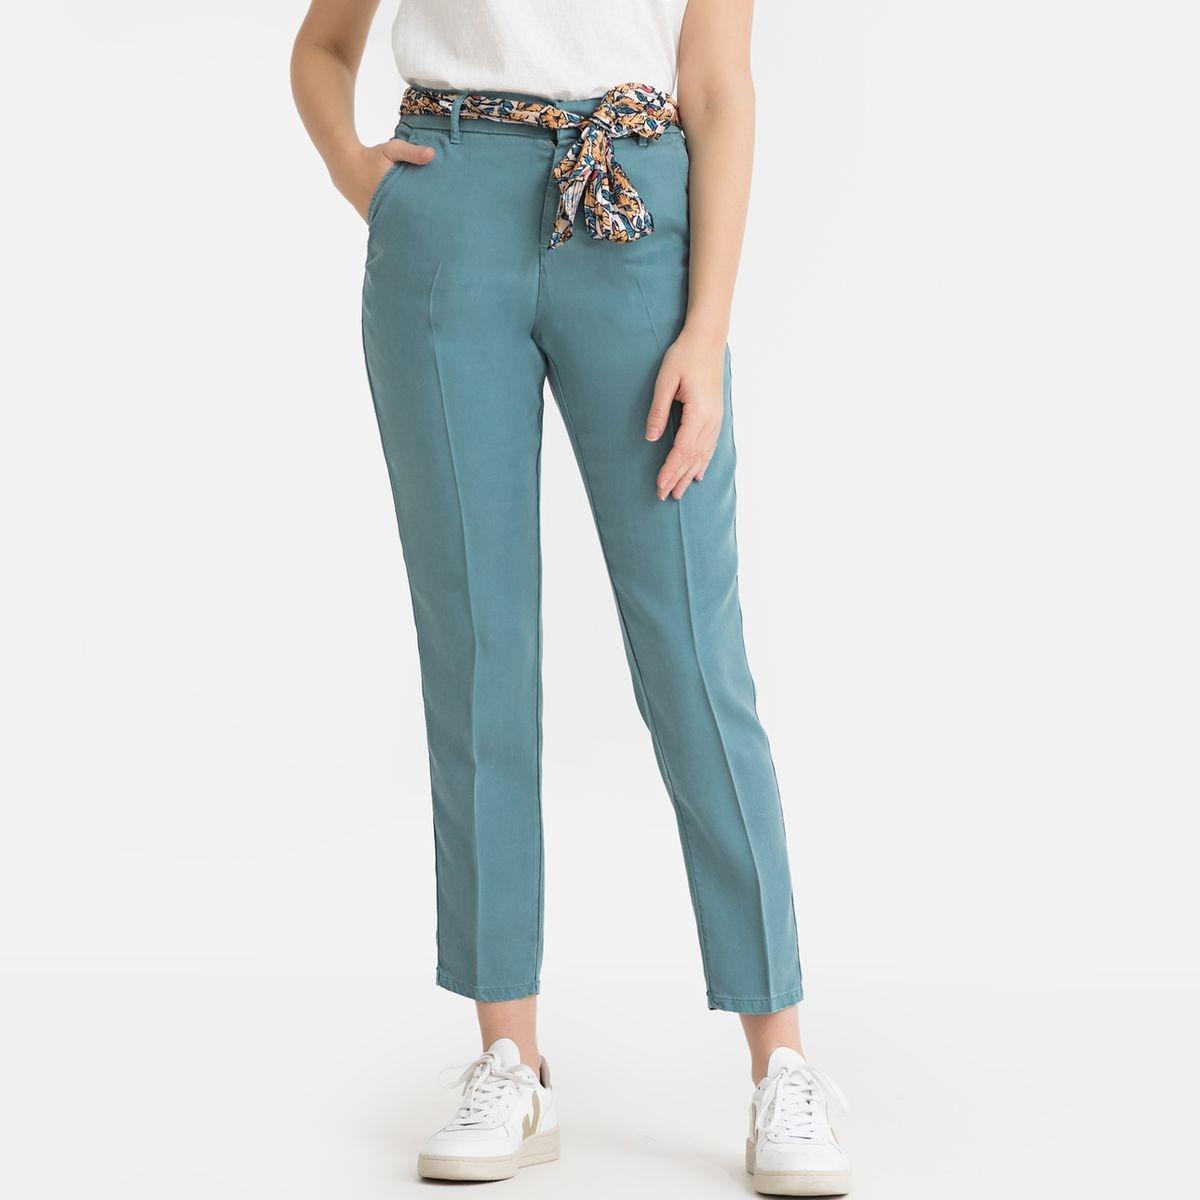 Pantalon droit ceinture foulard